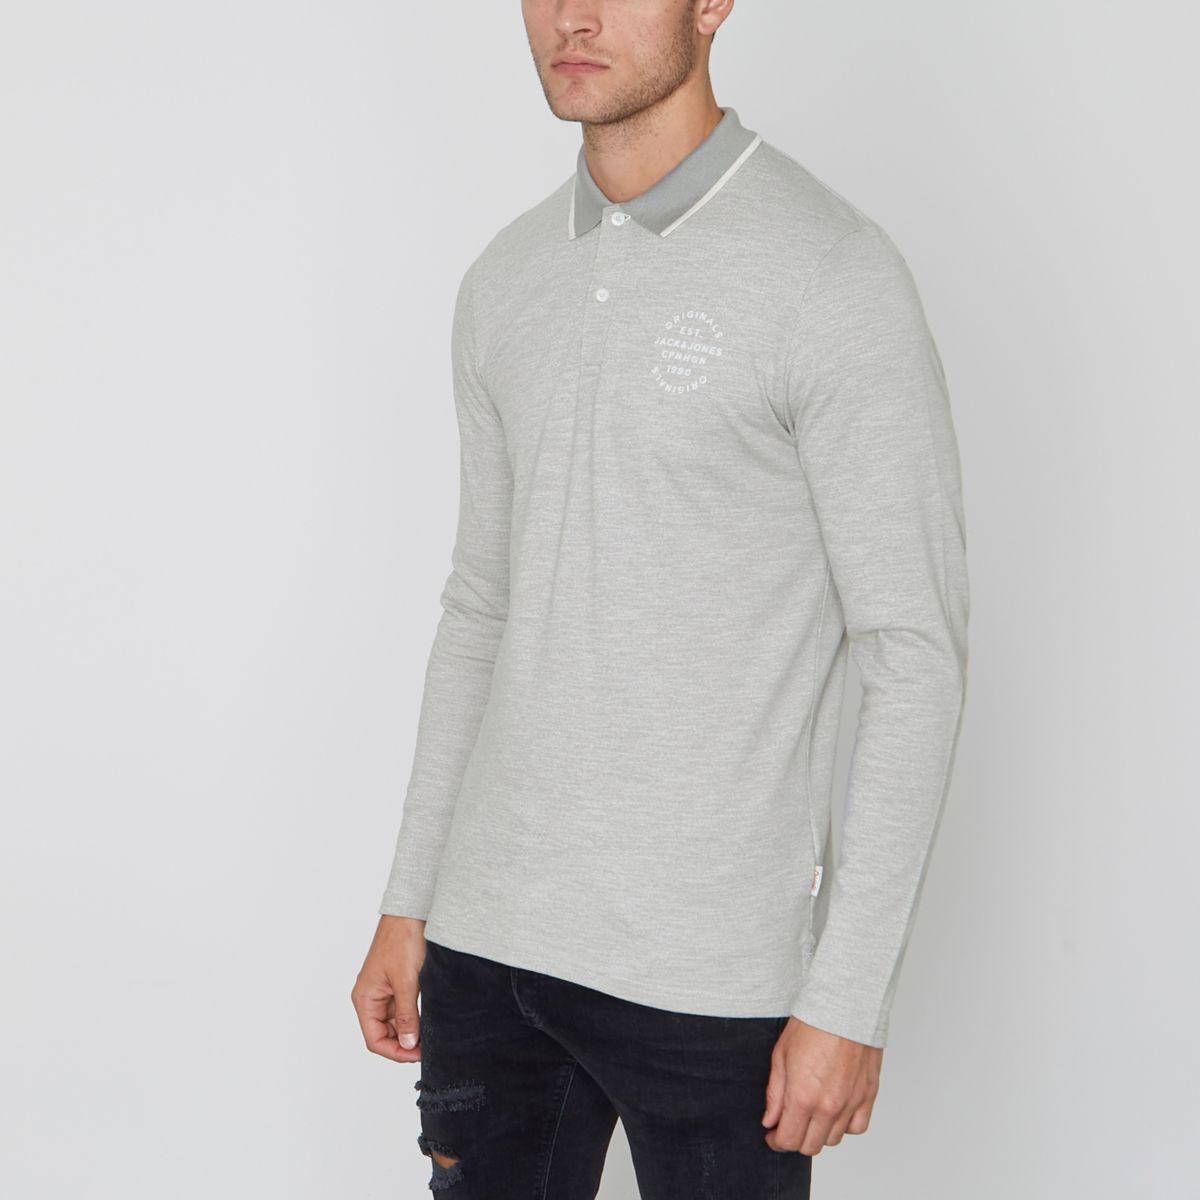 Grey Jack & Jones long sleeve polo shirt